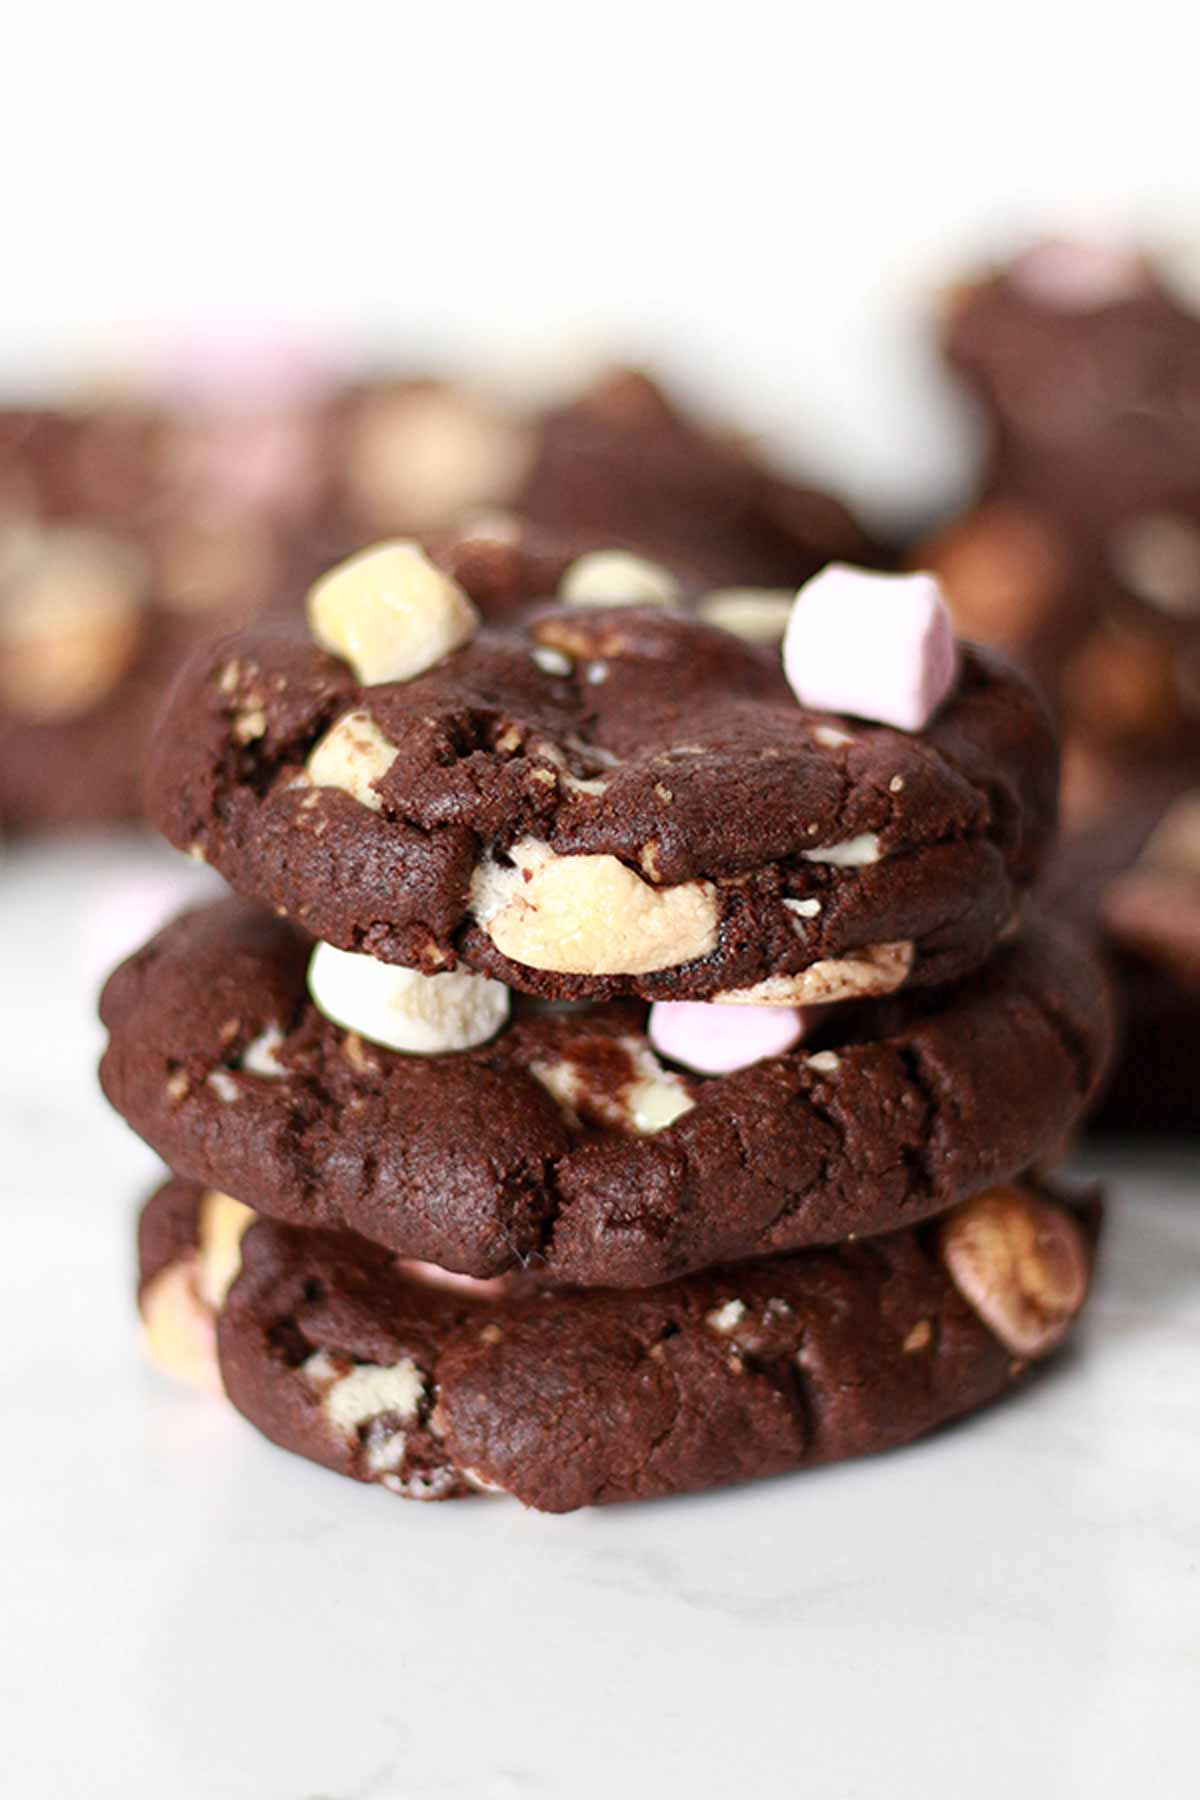 Stack Of 3 Vegan Chocolate Marshmallow Cookies